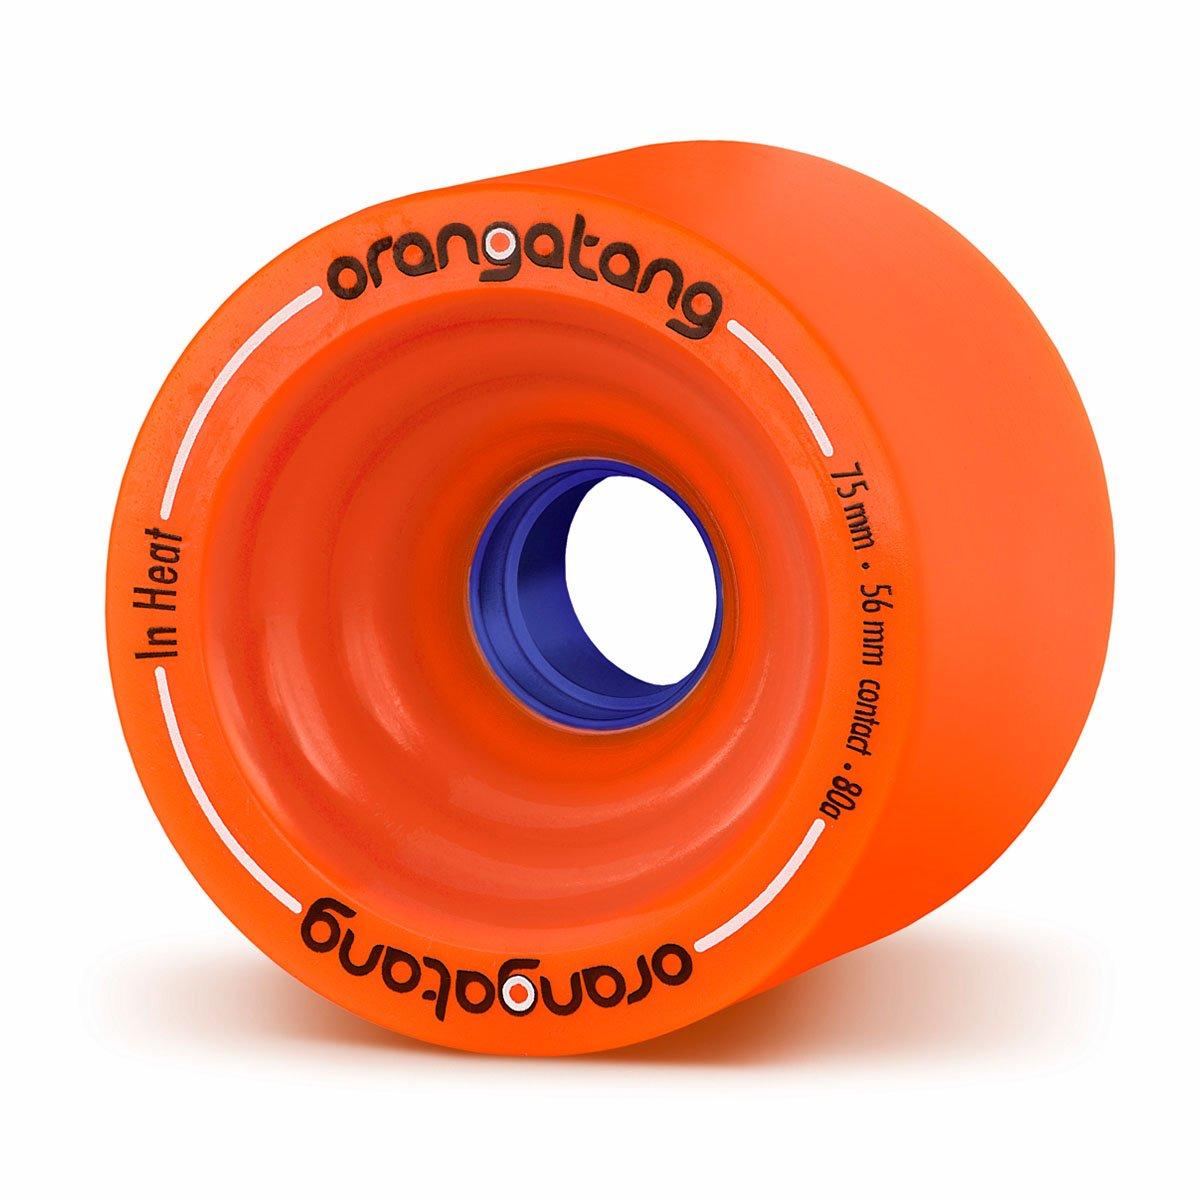 Orangatang in Heat 75 mm 80a Downhill Longboard Skateboard Cruising Wheels w/Loaded Jehu V2 Bearings (Orange, Set of 4) by Orangatang